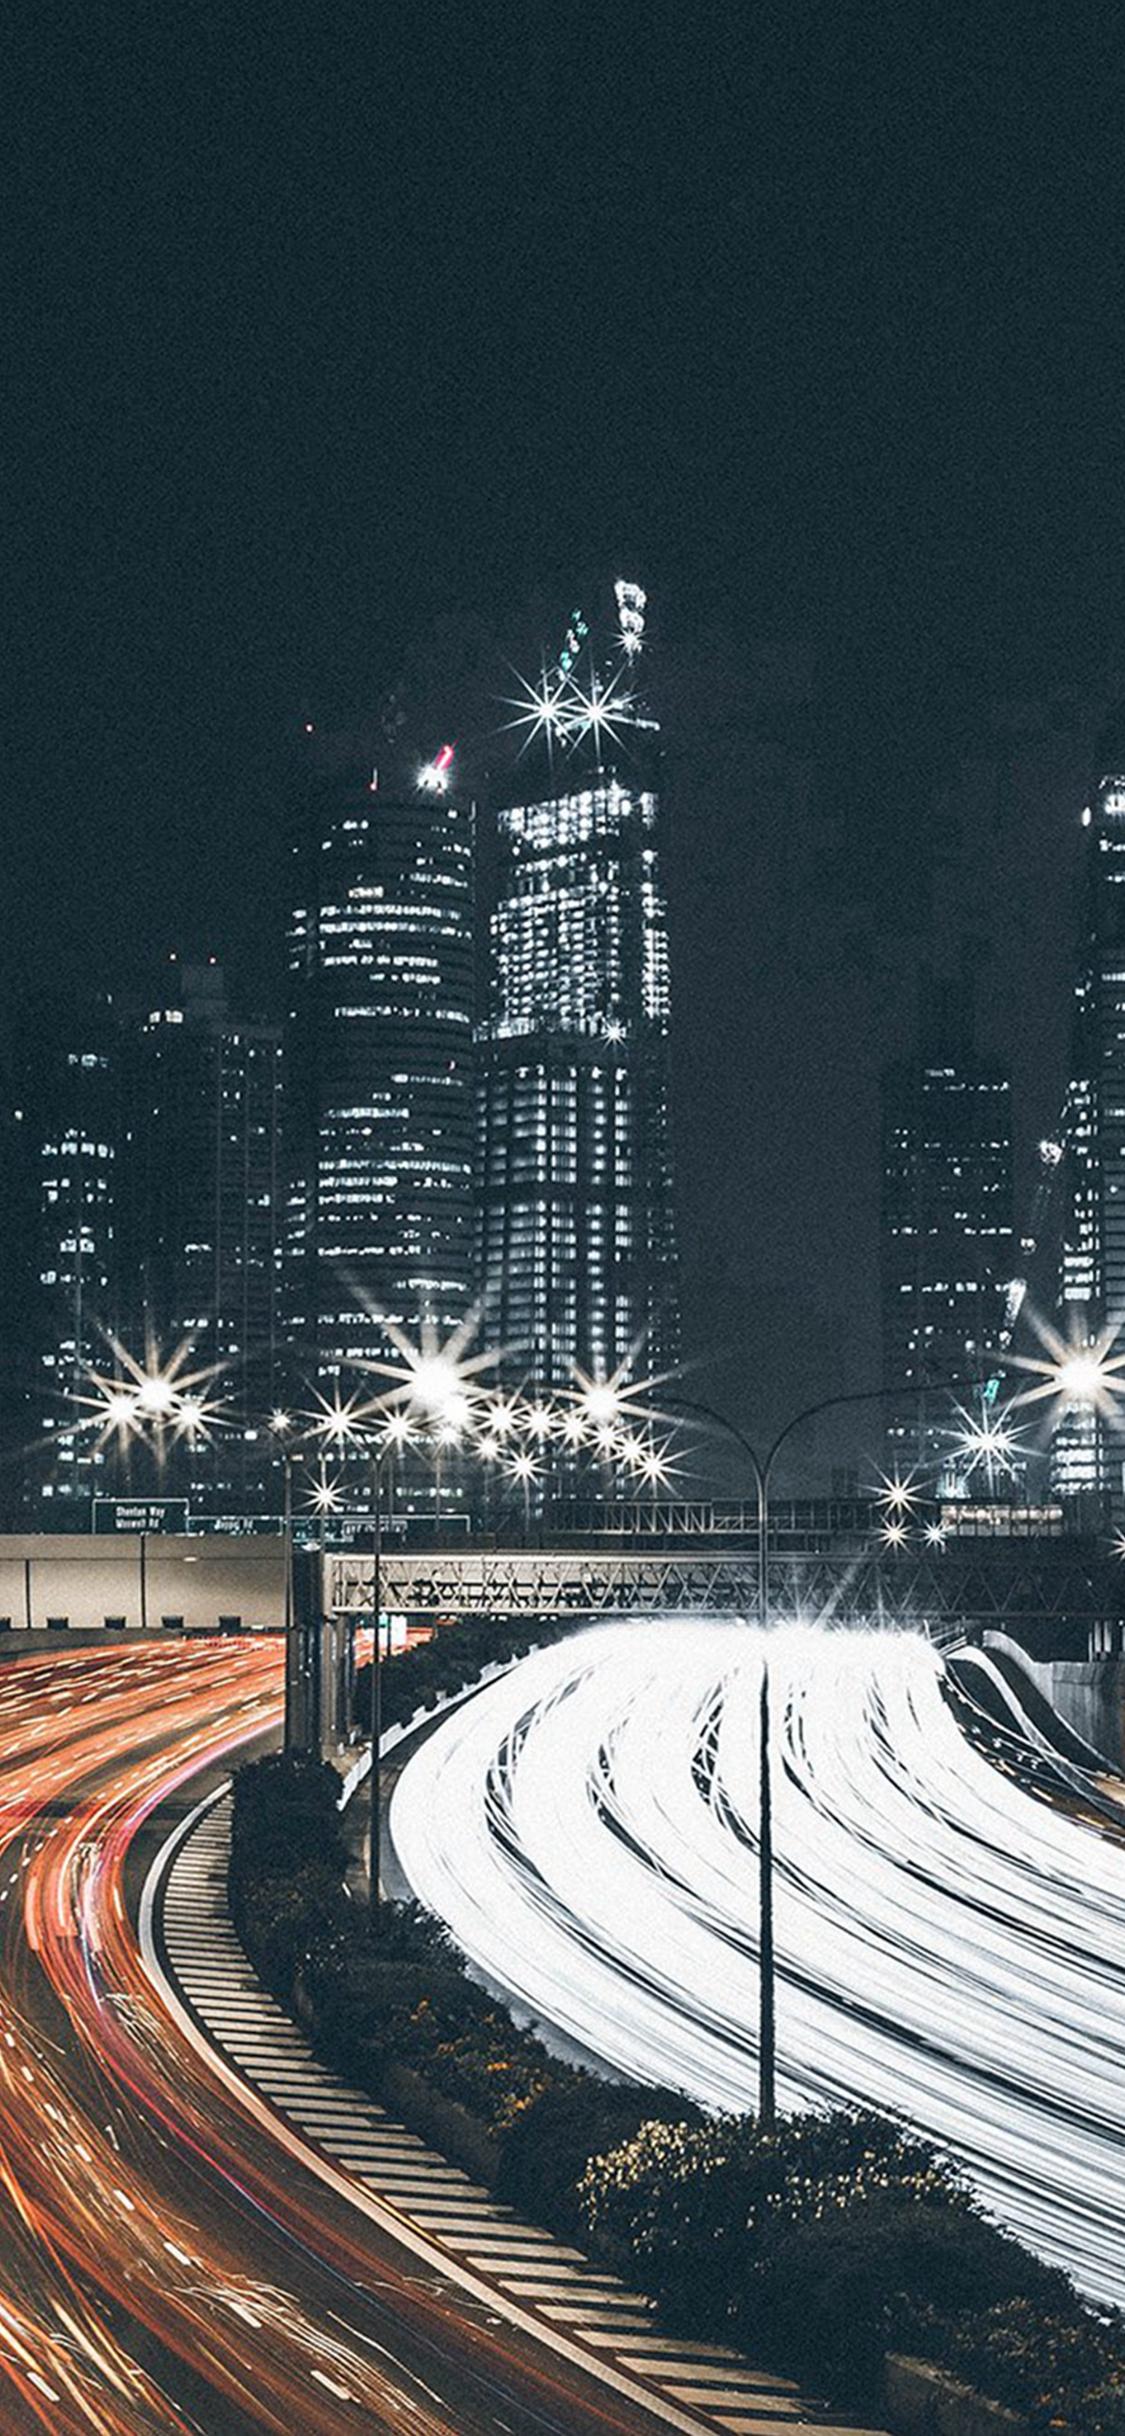 City Car Night View Dark Nature Iphone X Wallpapers Free